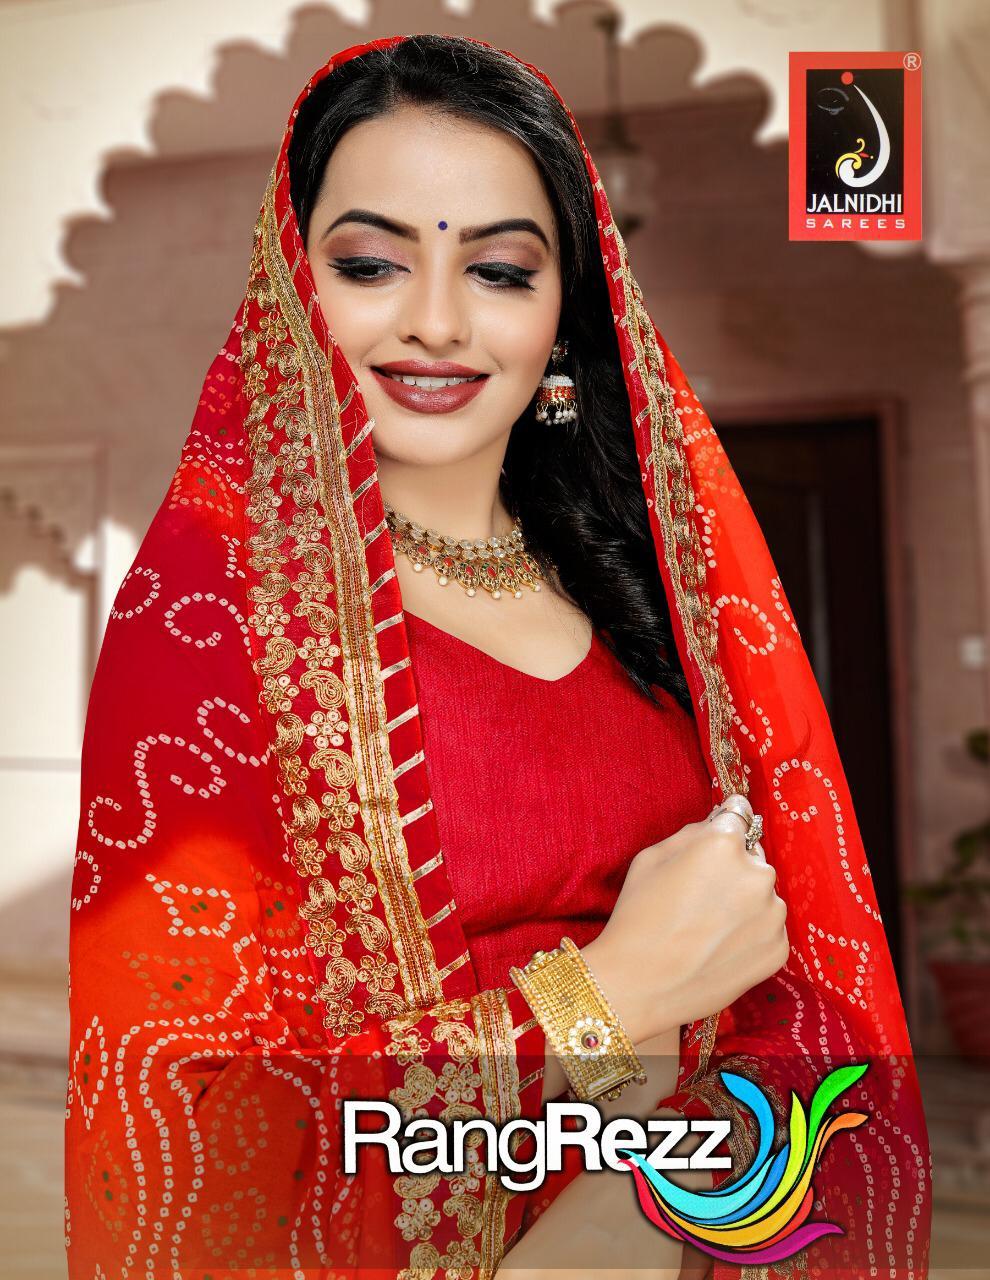 Jalnidhi Rangrezz Bandhej Lehariya Saris With Border Concept Buy Online